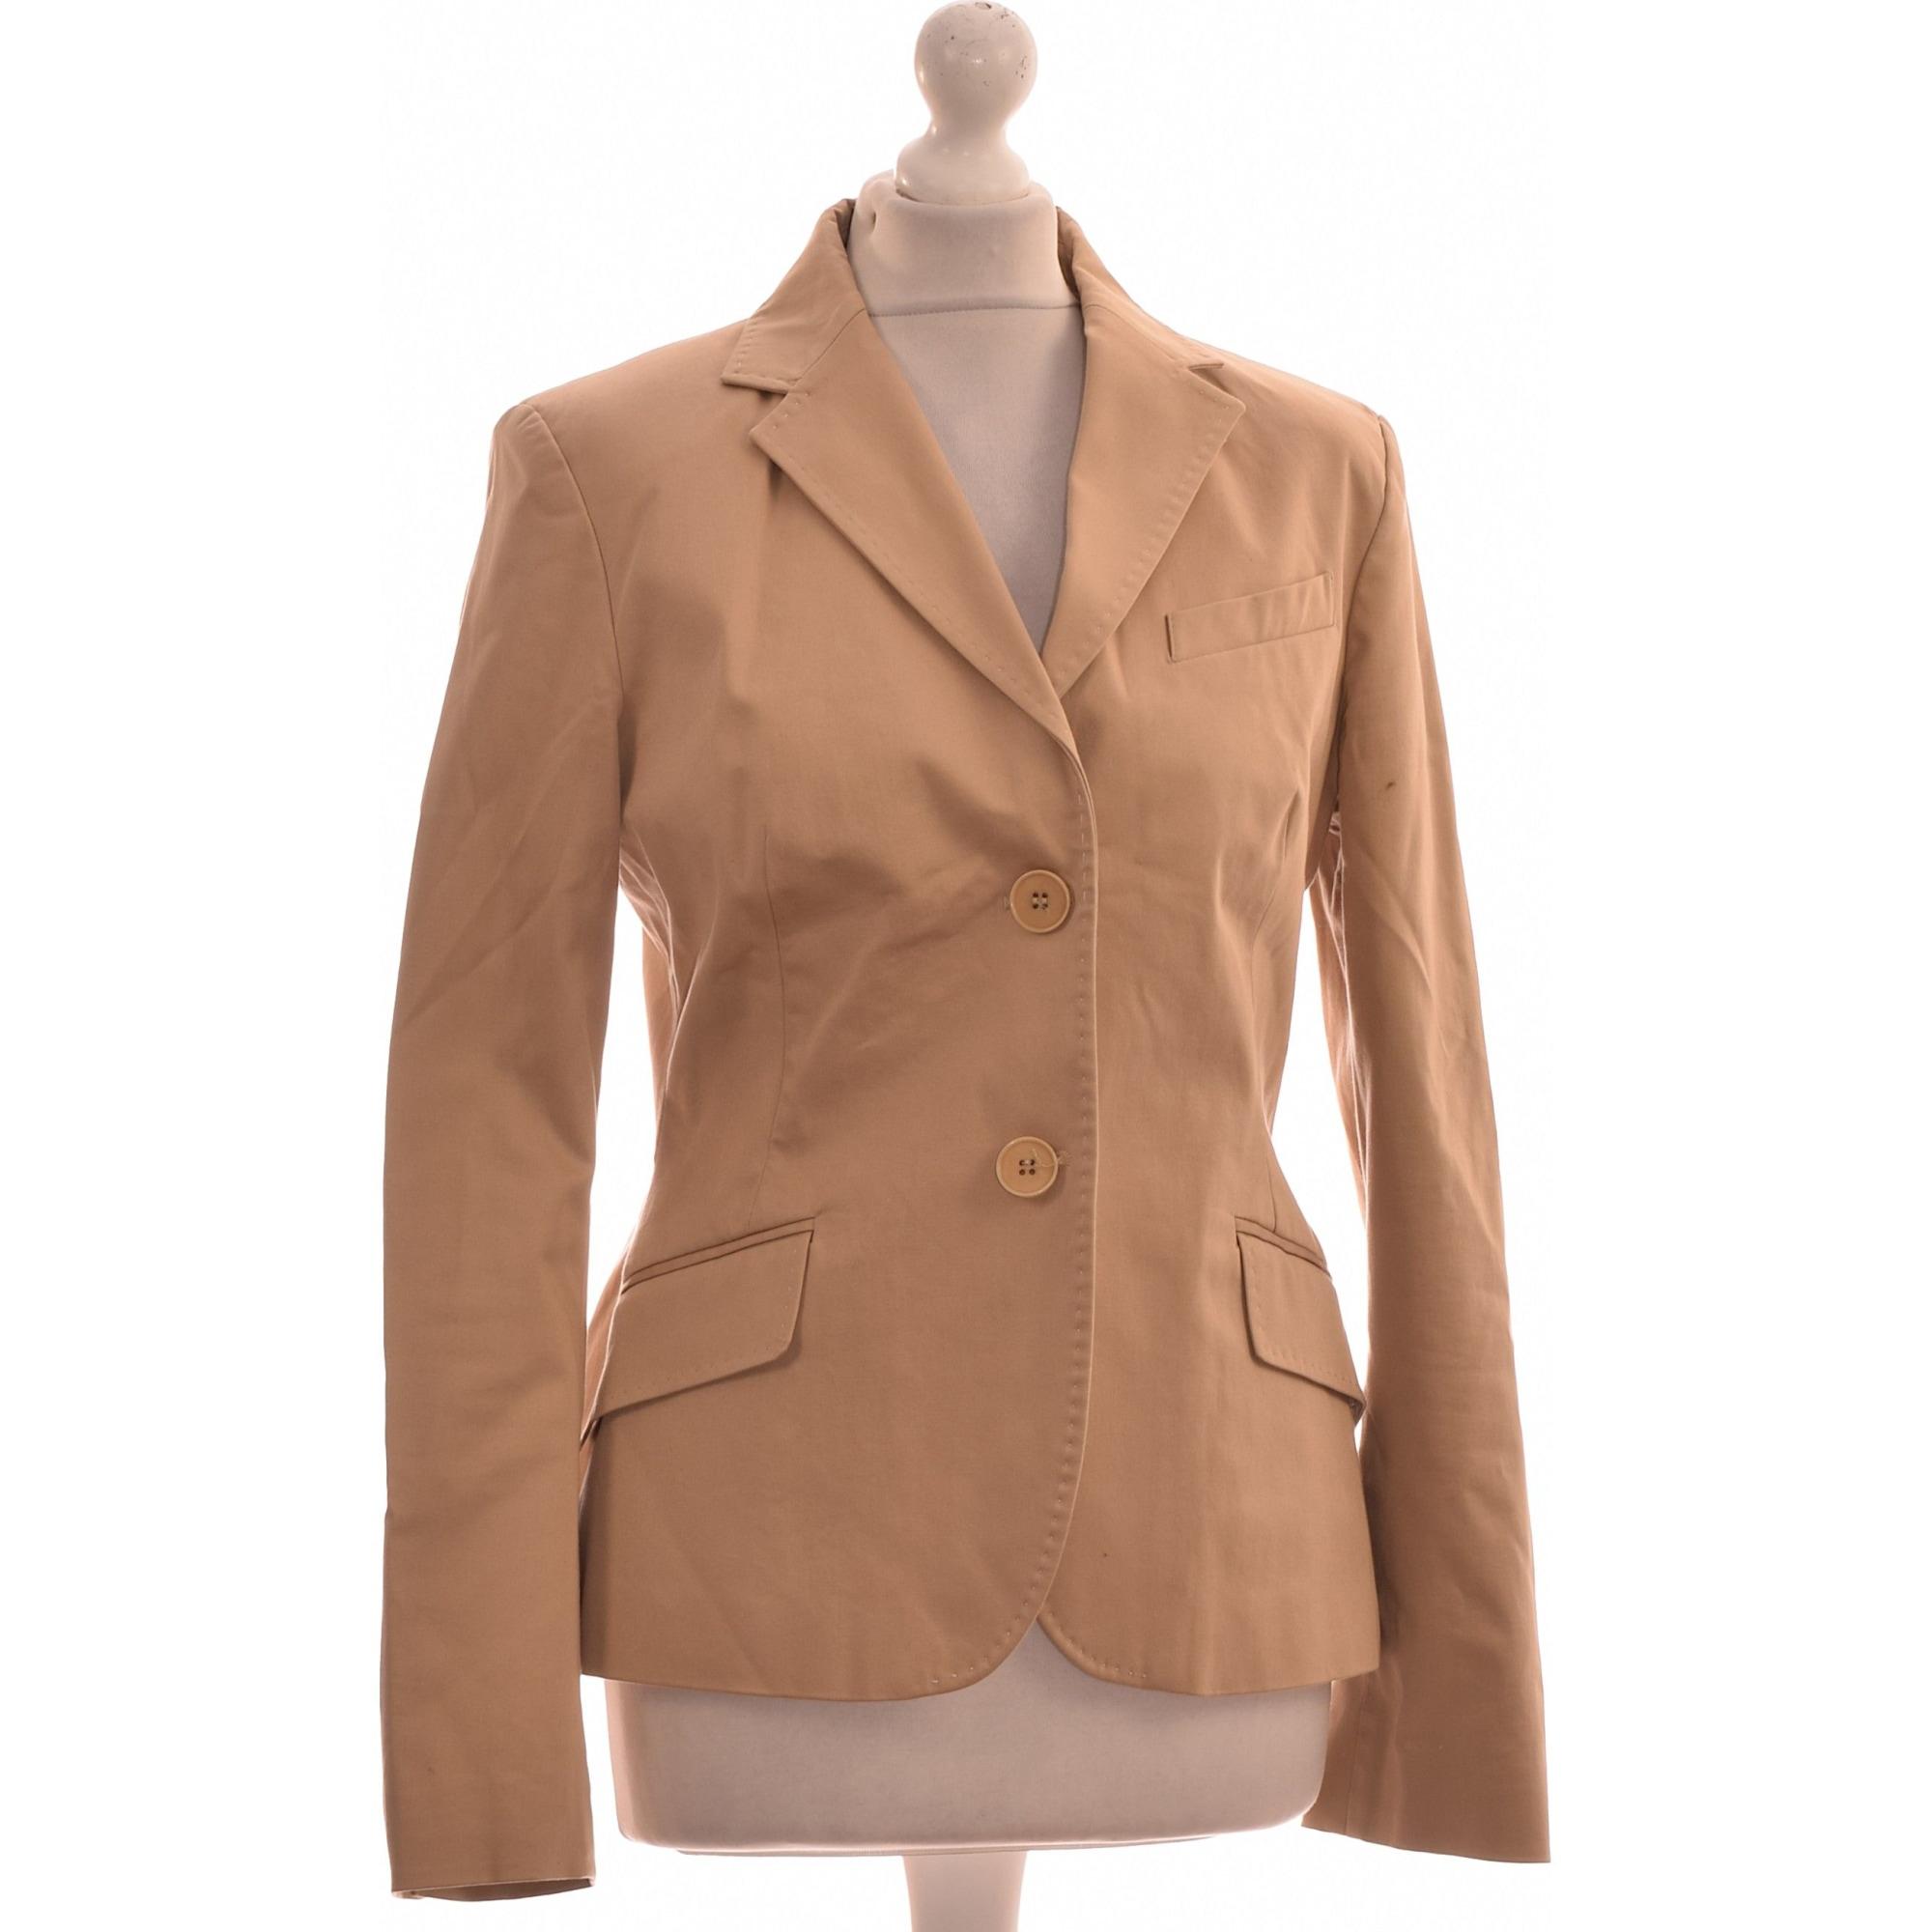 Blazer, veste tailleur ZARA 40 (L, T3) beige 9324957